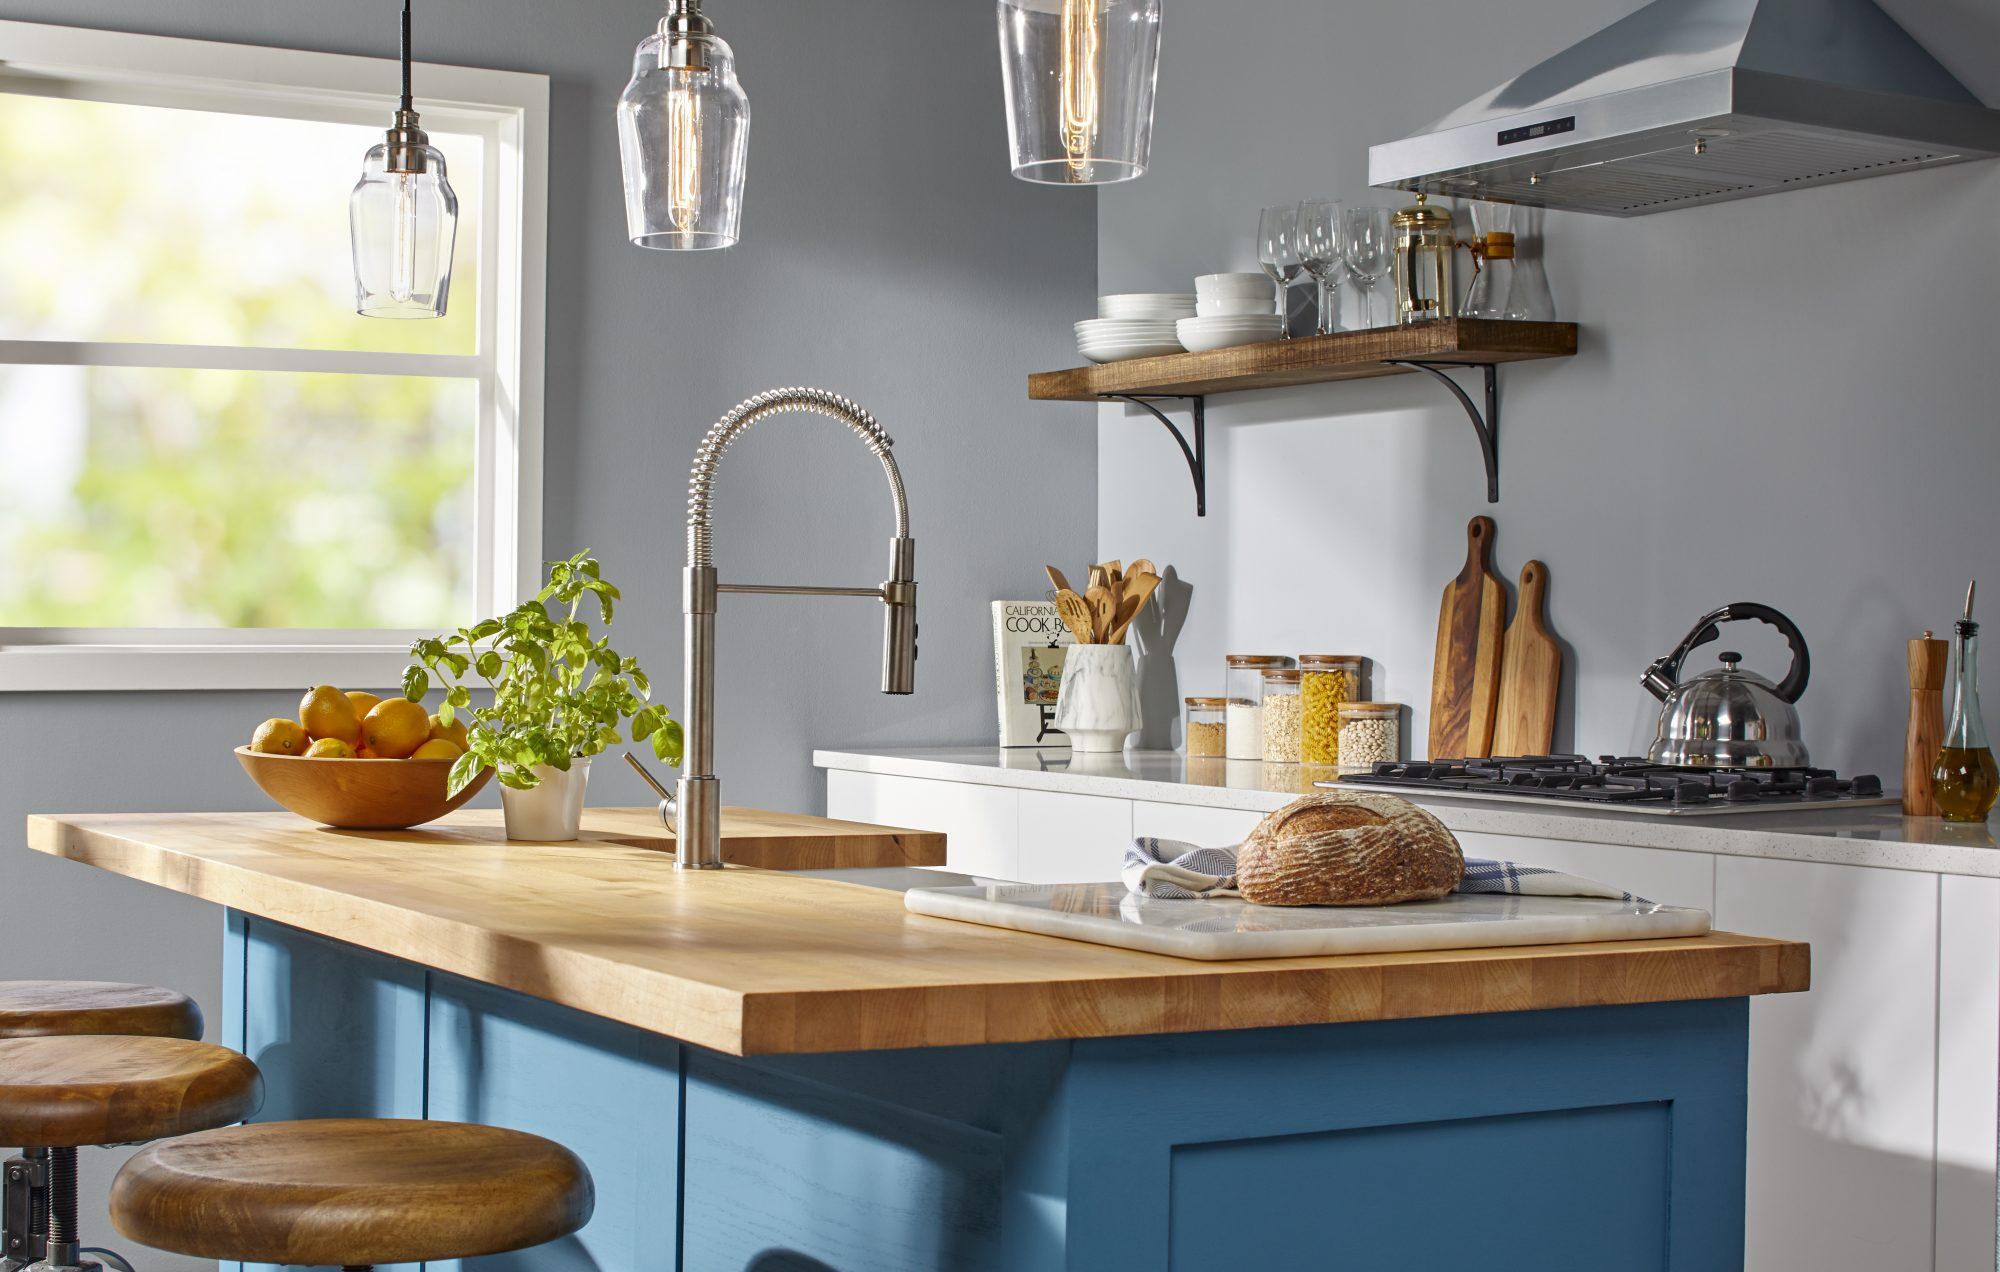 https: img.okezone.com content 2021 07 31 470 2448797 5-tips-menata-dapur-cantik-ingat-jangan-simpan-banyak-barang-w1ri36Rmjn.jpg